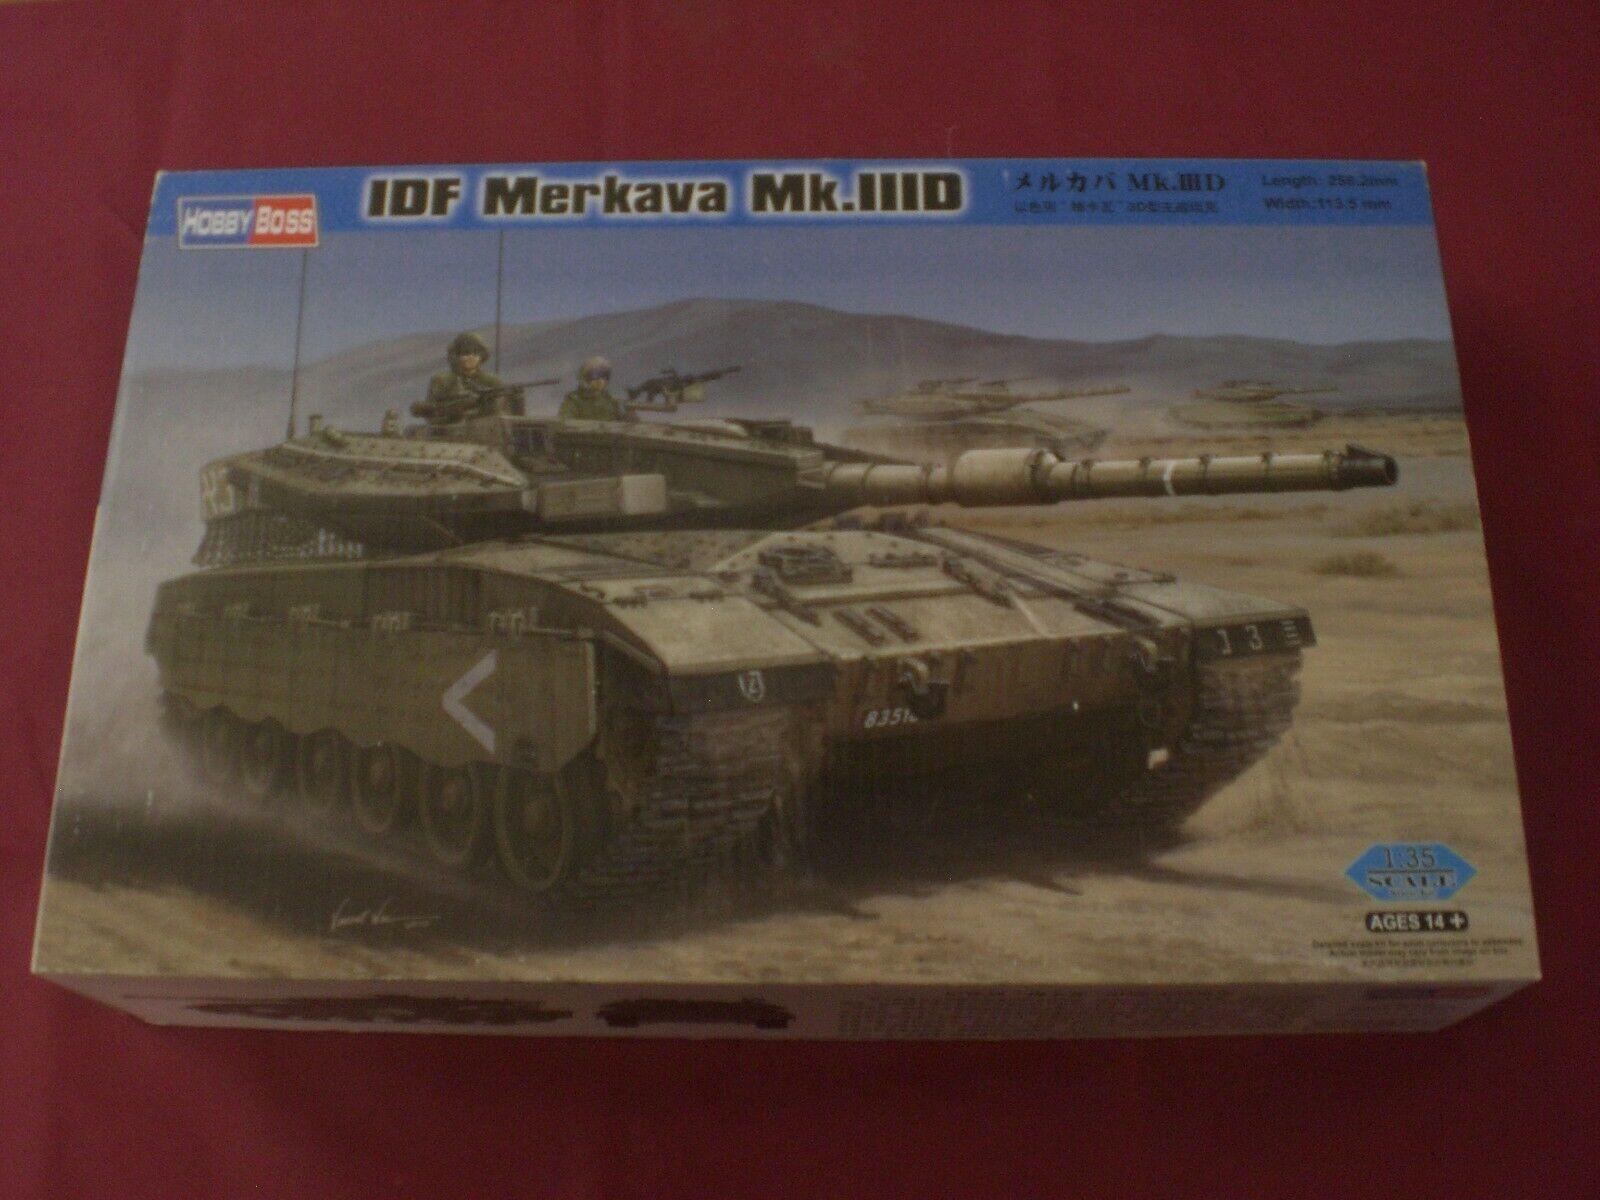 IDF Merkava  Mk.IIID - SCALA 1 35 Trumpeter